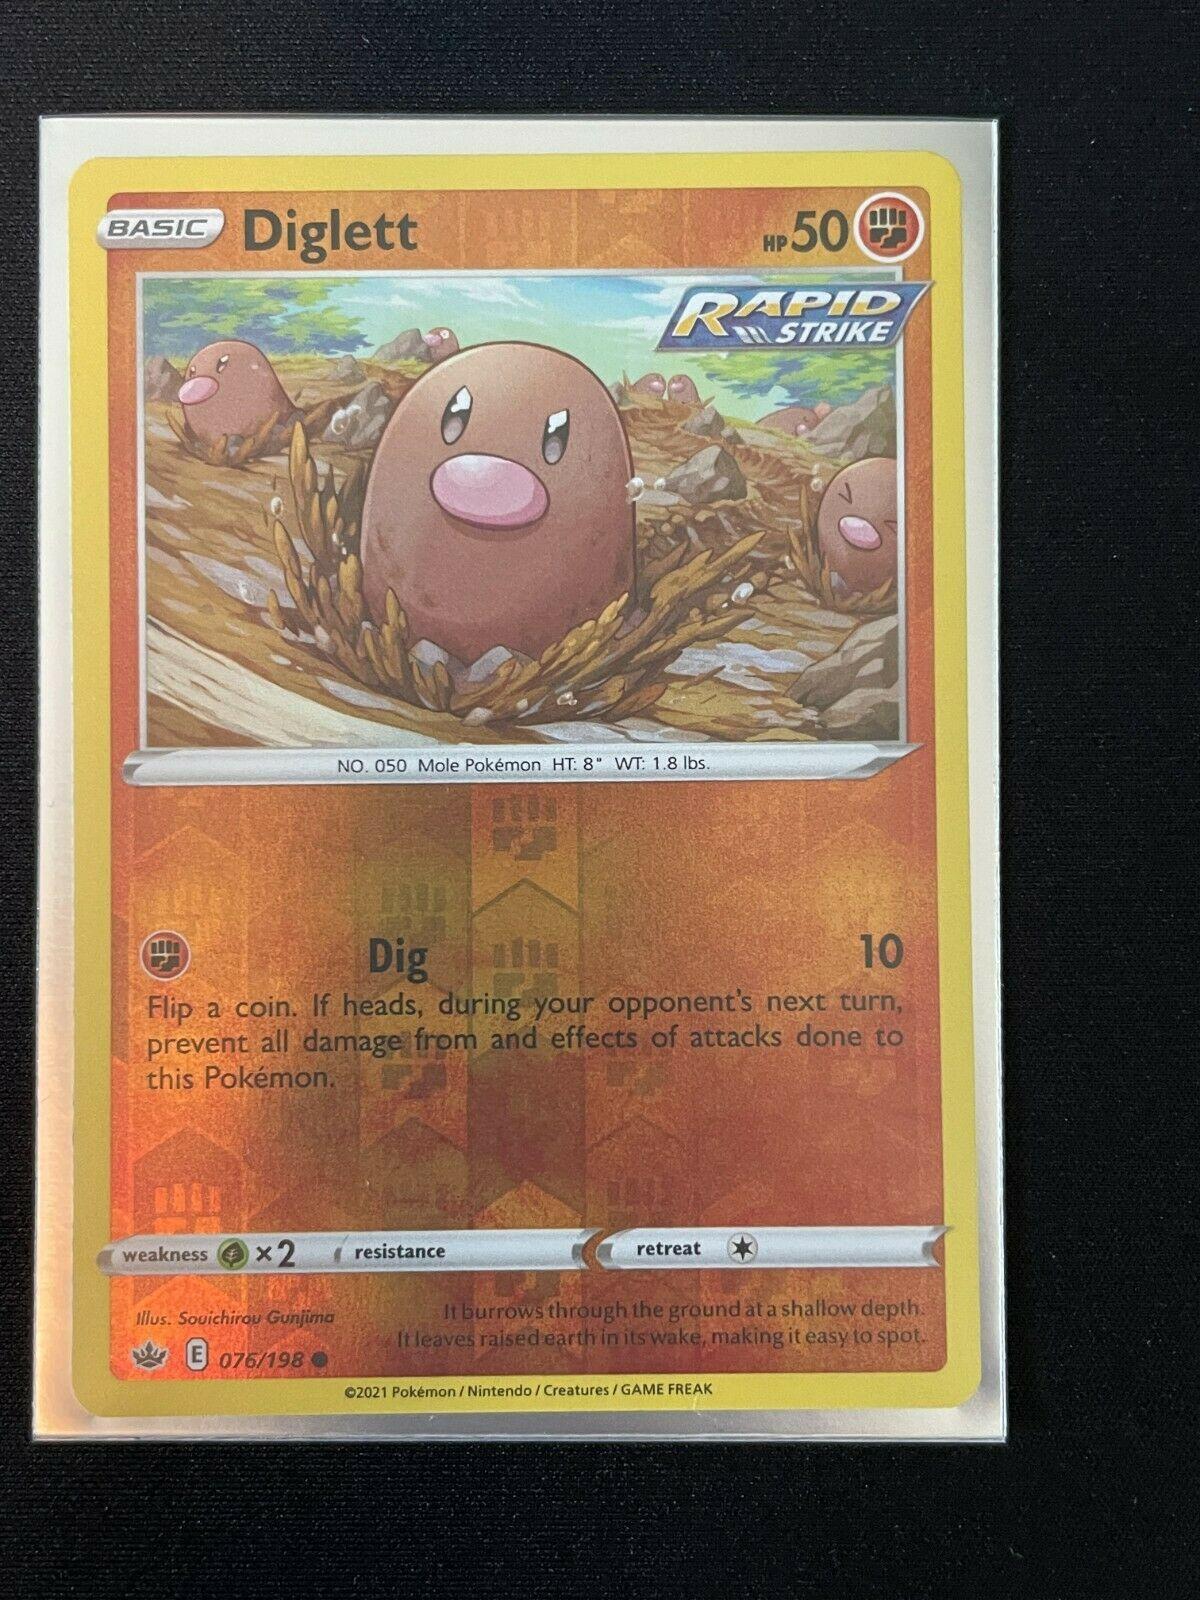 Pokemon Chilling Reign Diglett 076/198 Common Reverse Holo NM